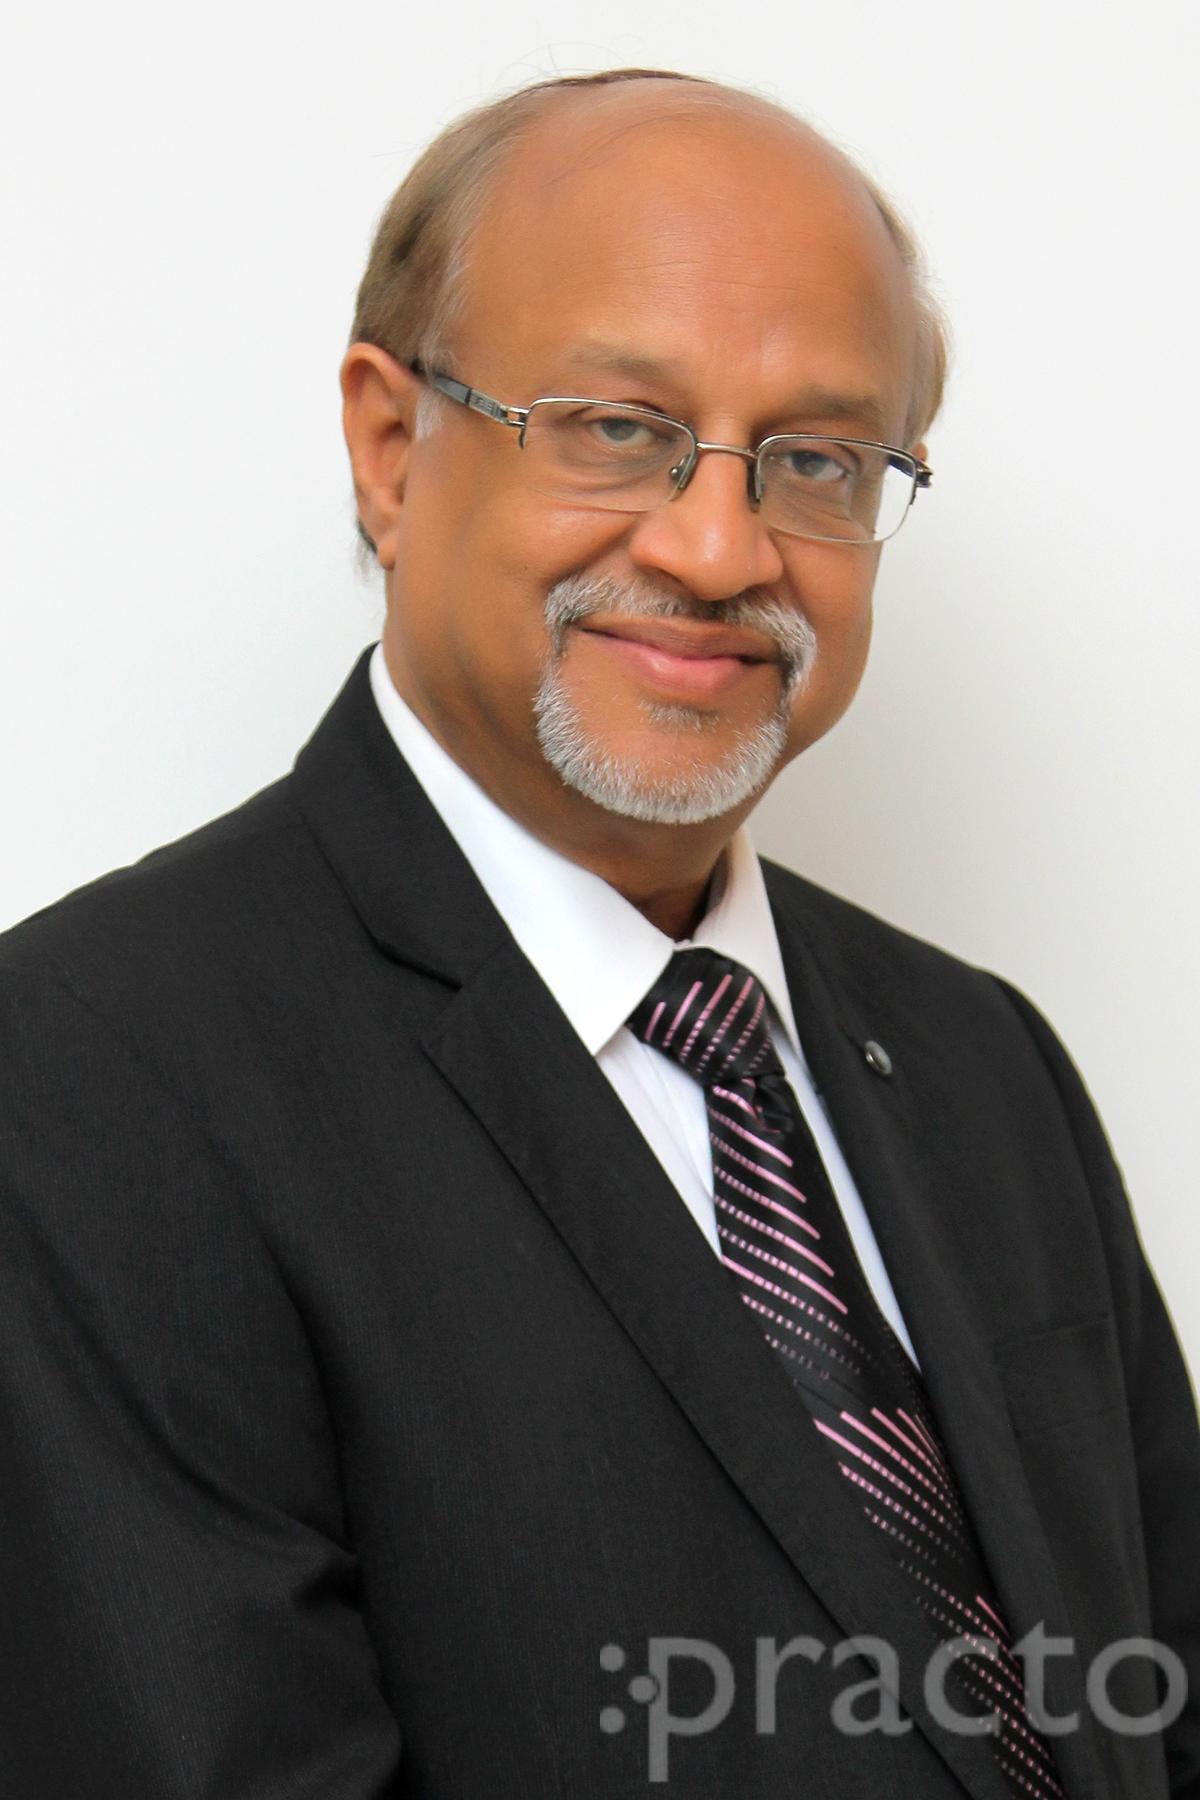 Dr. Rajendra Saraogi - Gynecologist/Obstetrician